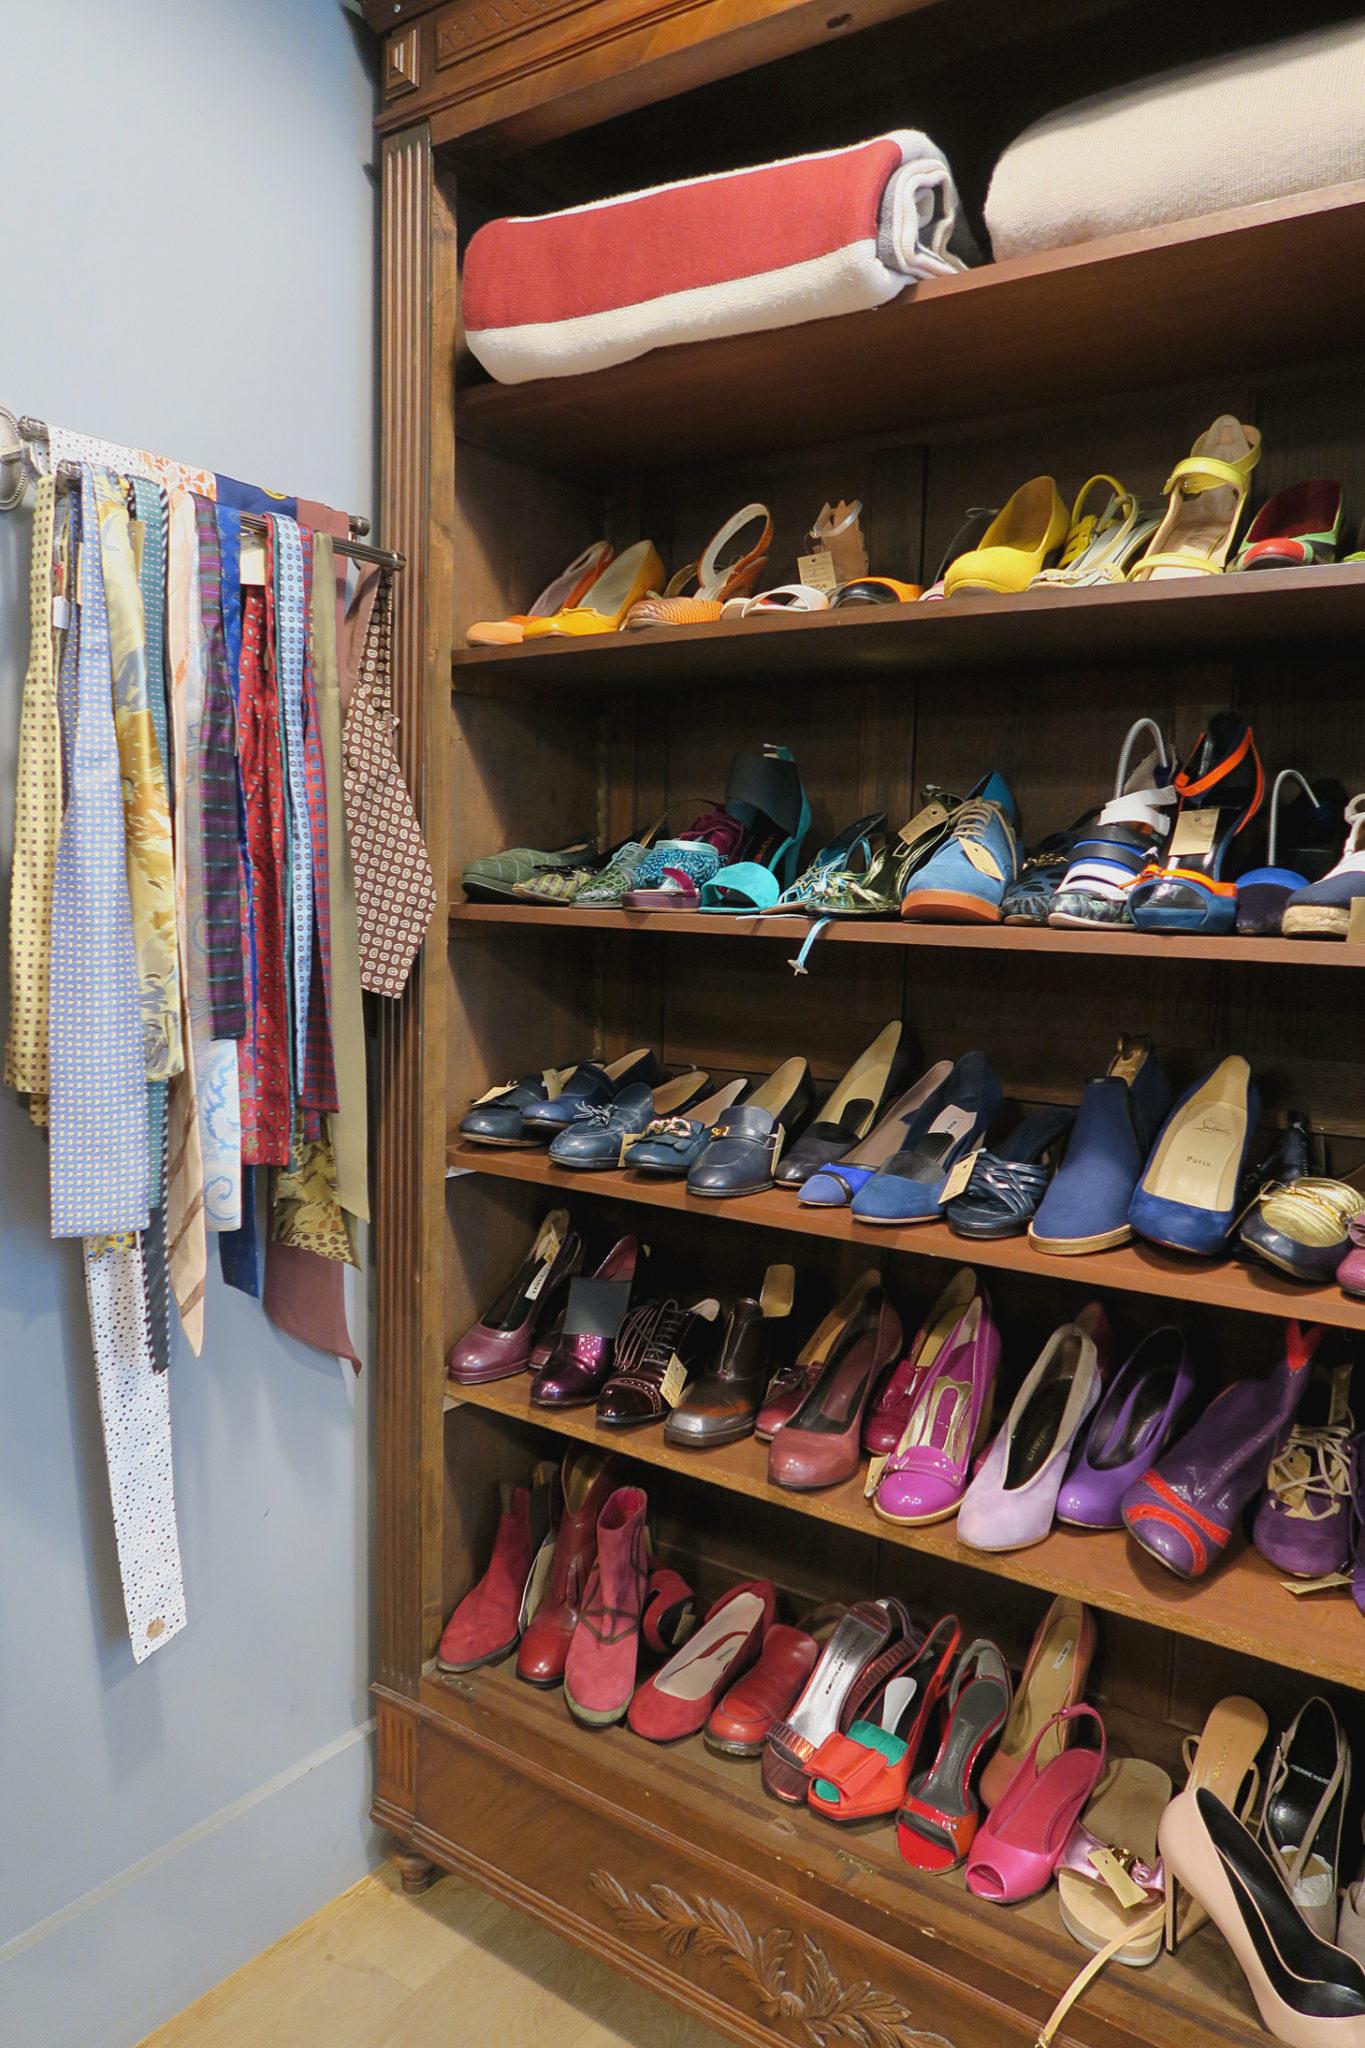 Hema_Balade_friperies_paris_thanx_god_iam_vip_boutique_femme_chaussures